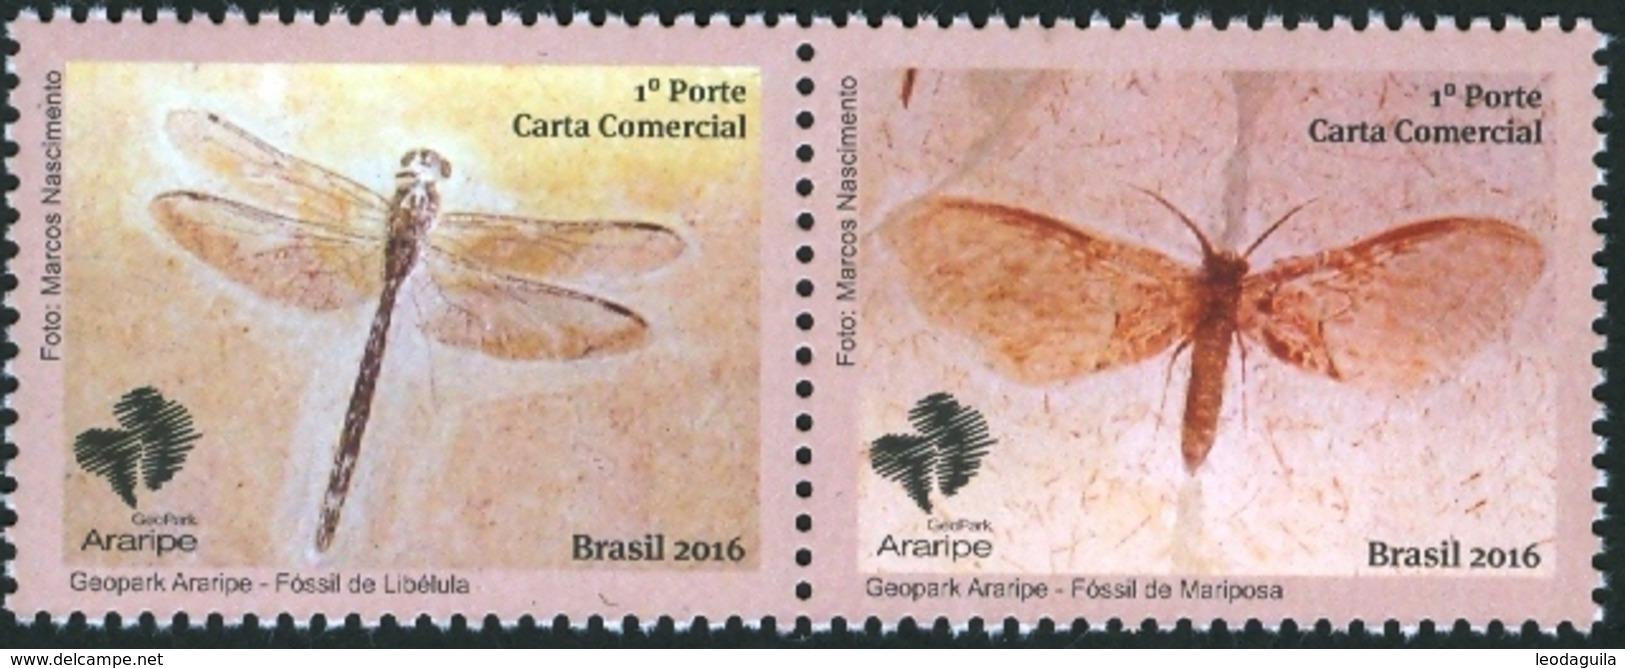 BRAZIL 2016  -  ARARIPE  GEOPARK   -  2v   MNH - Unused Stamps